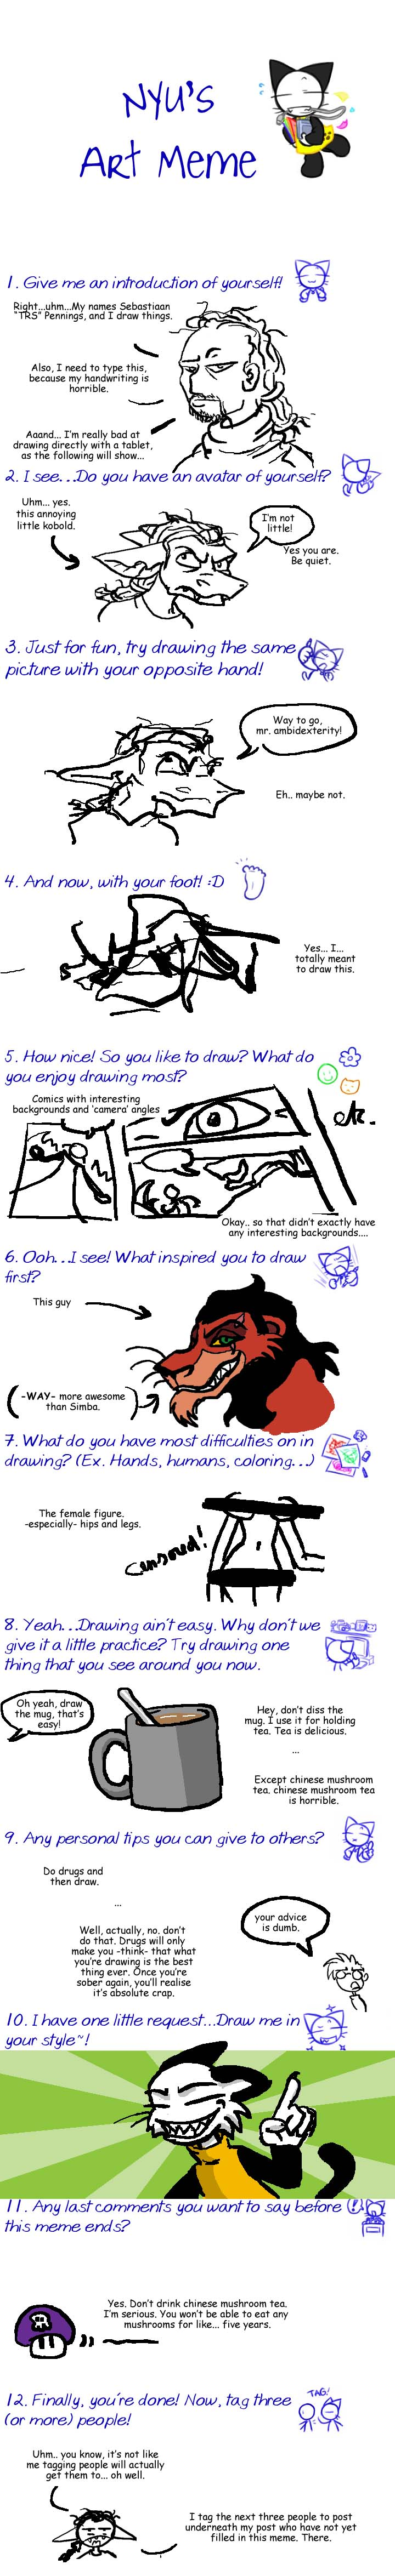 nyu's art meme by trs